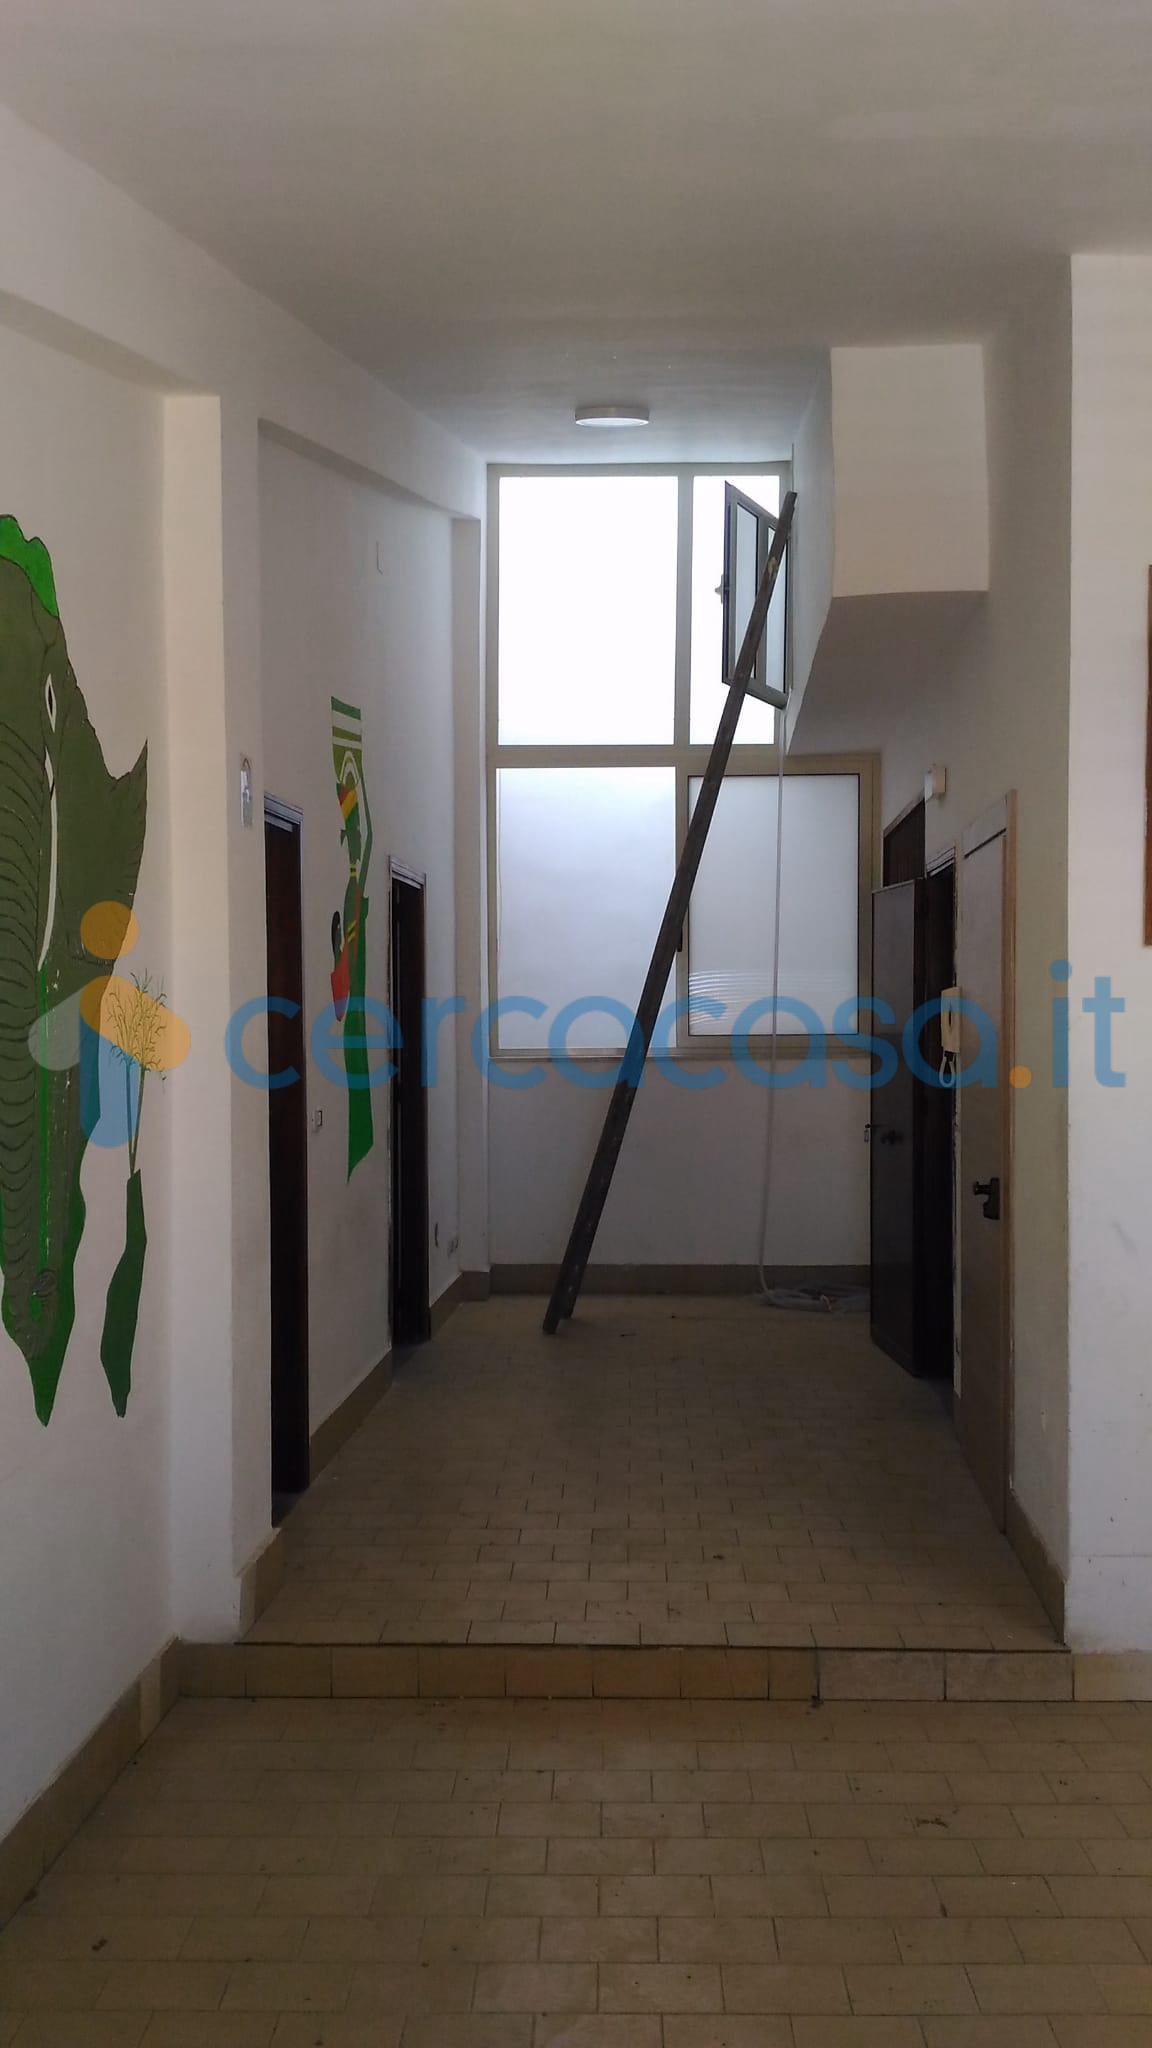 _altavilla-_milicia-__002d-_v_a022-__002d-n__00b03-_appartamenti-in-_blocco-